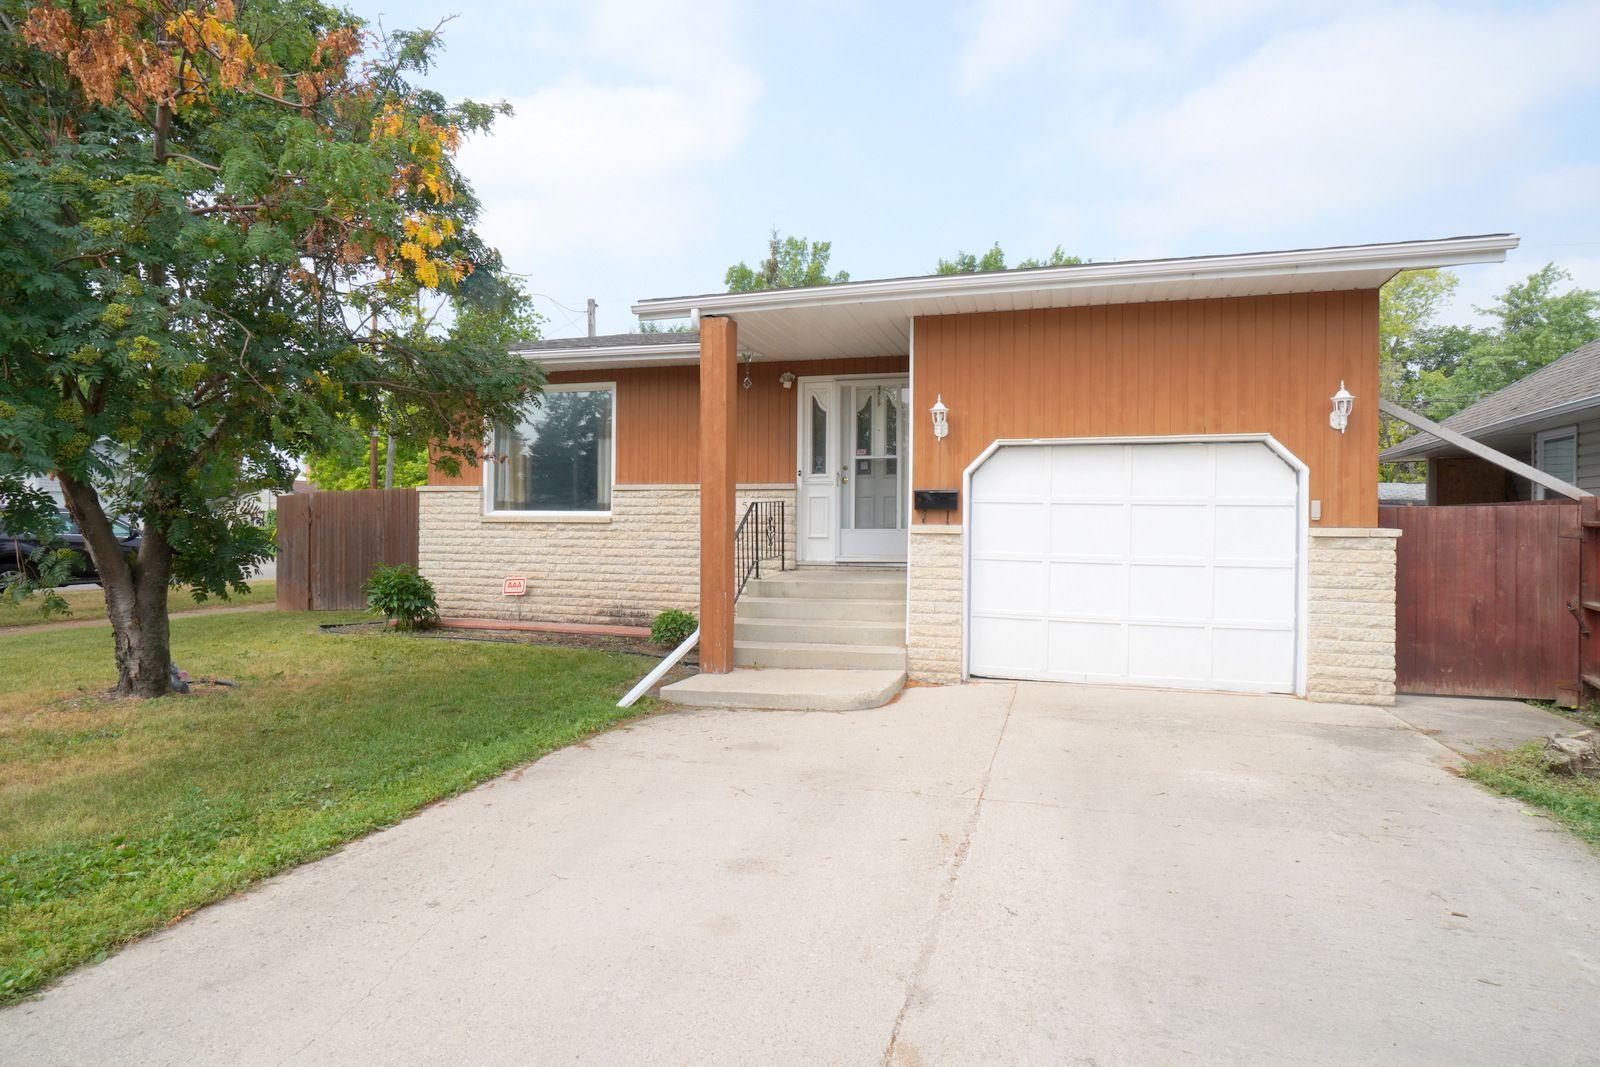 Main Photo: 501 MIdland St in Portage la Prairie: House for sale : MLS®# 202118033